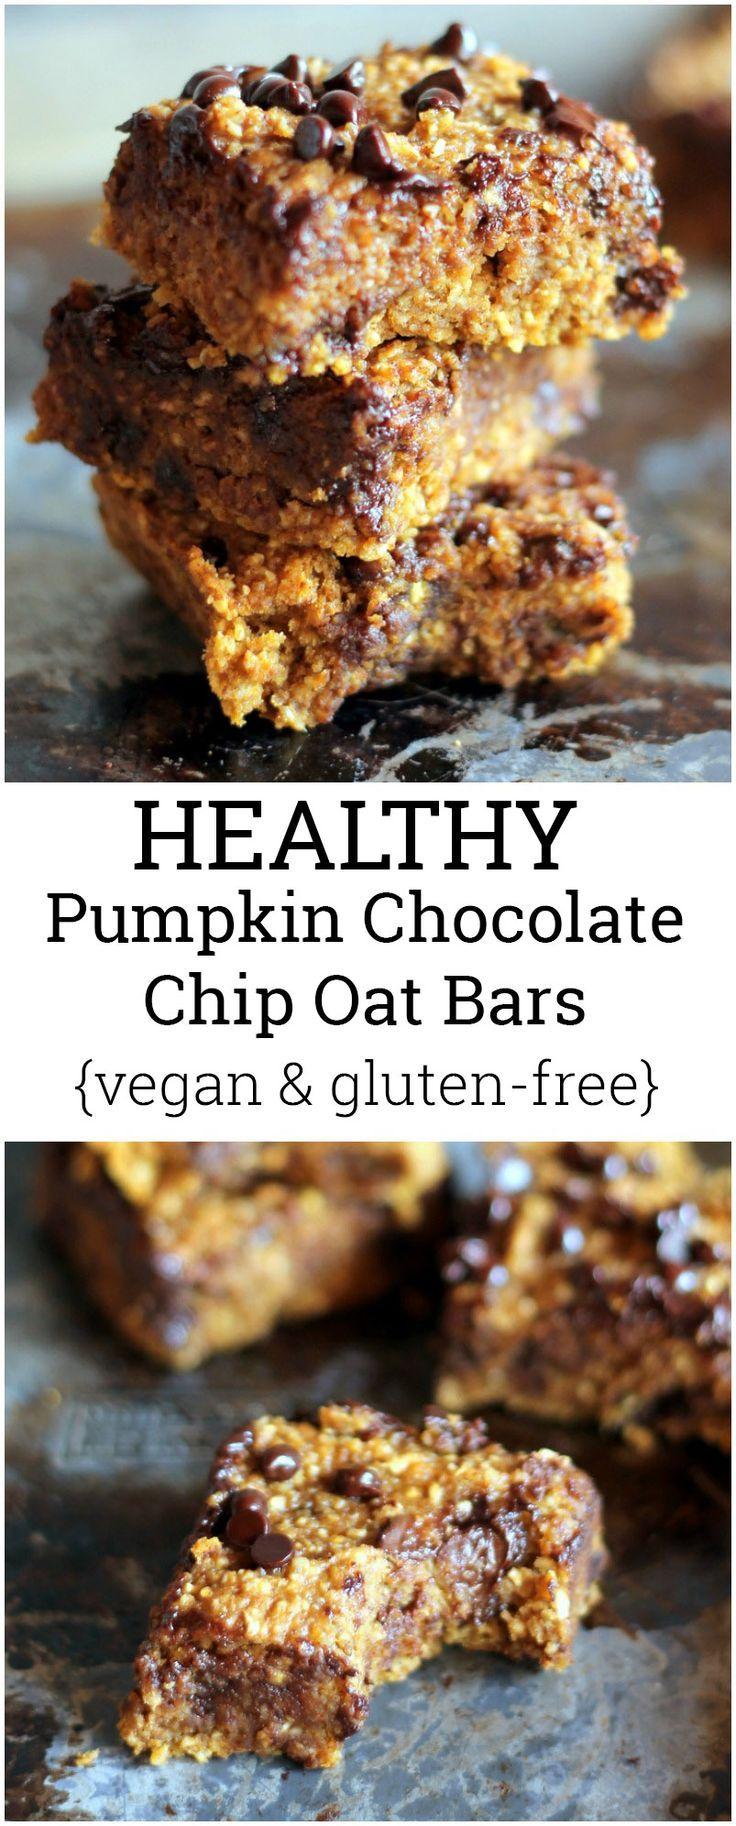 Recipe // Pumpkin + Applesauce + Oats + Baking Powder + Baking Soda + Brown Sugar + Chocolate Chips + Cinnamon + Cloves + Nutmeg + Salt + Vanilla Extract + Coconut Oil